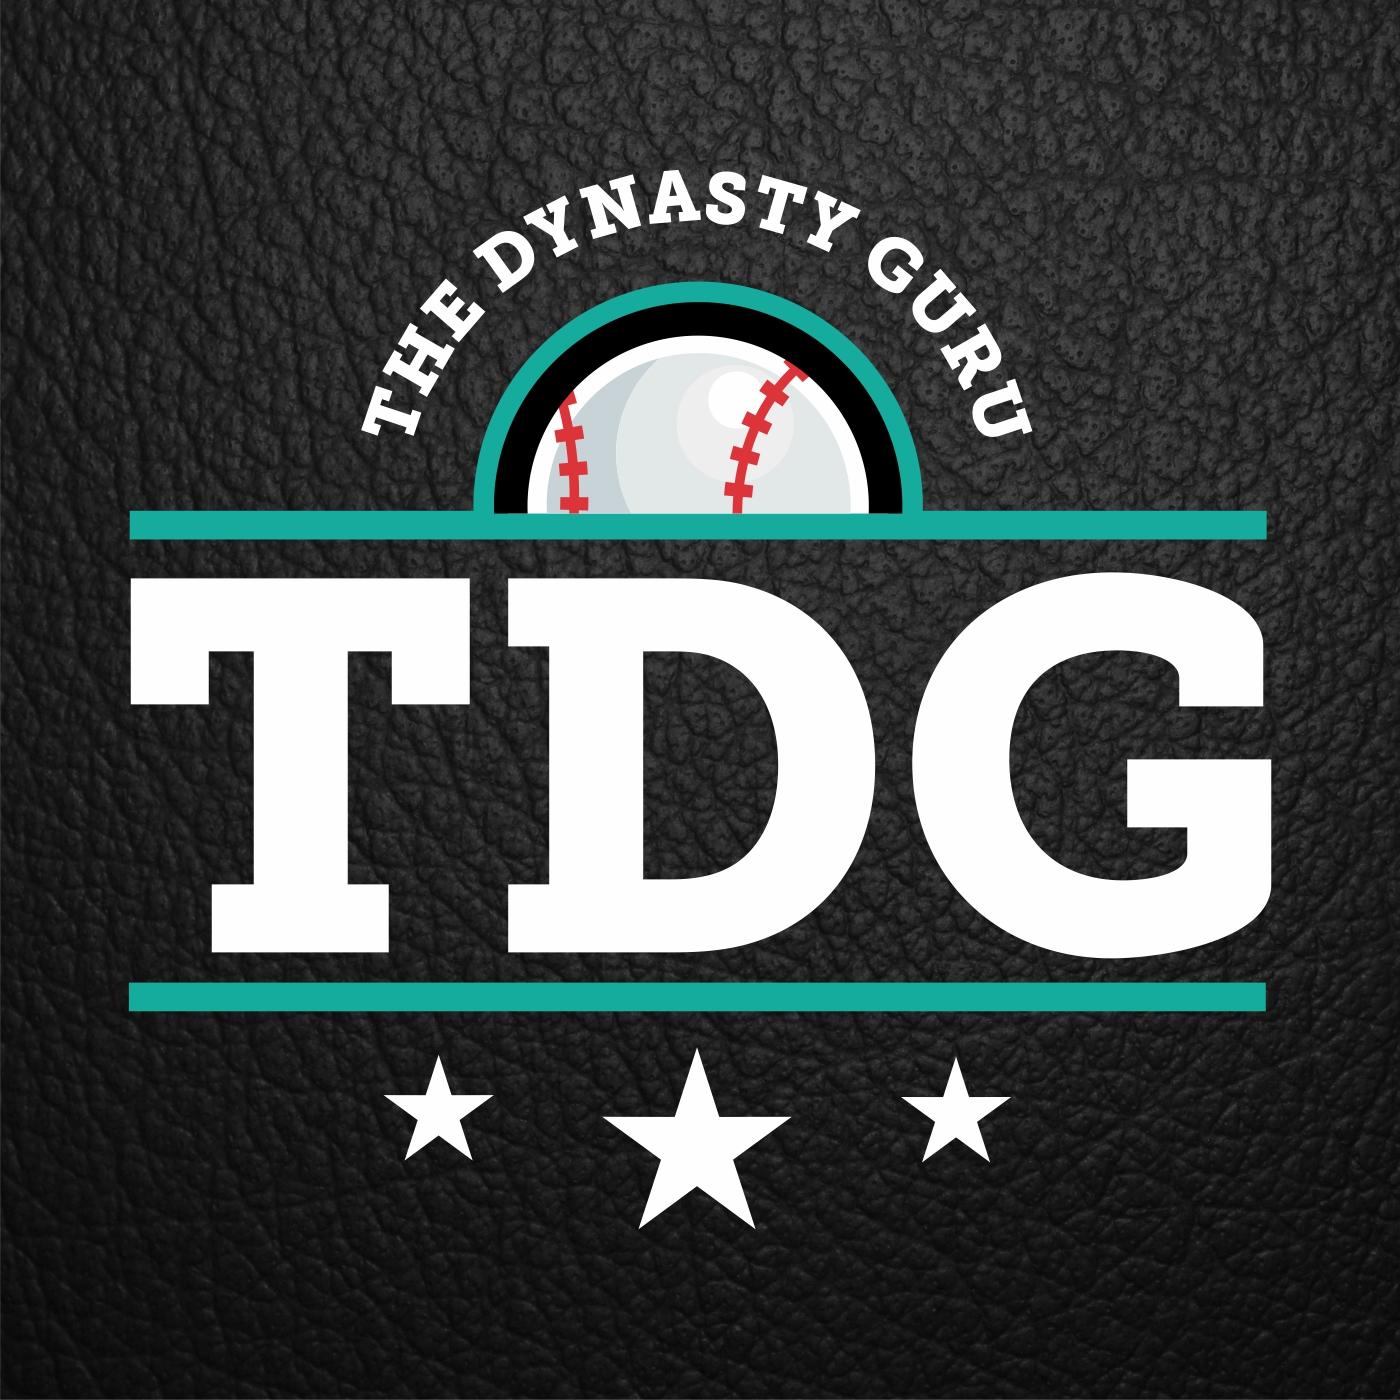 Introducing The Dynasty Guru's MLB Equivalency Calculator for